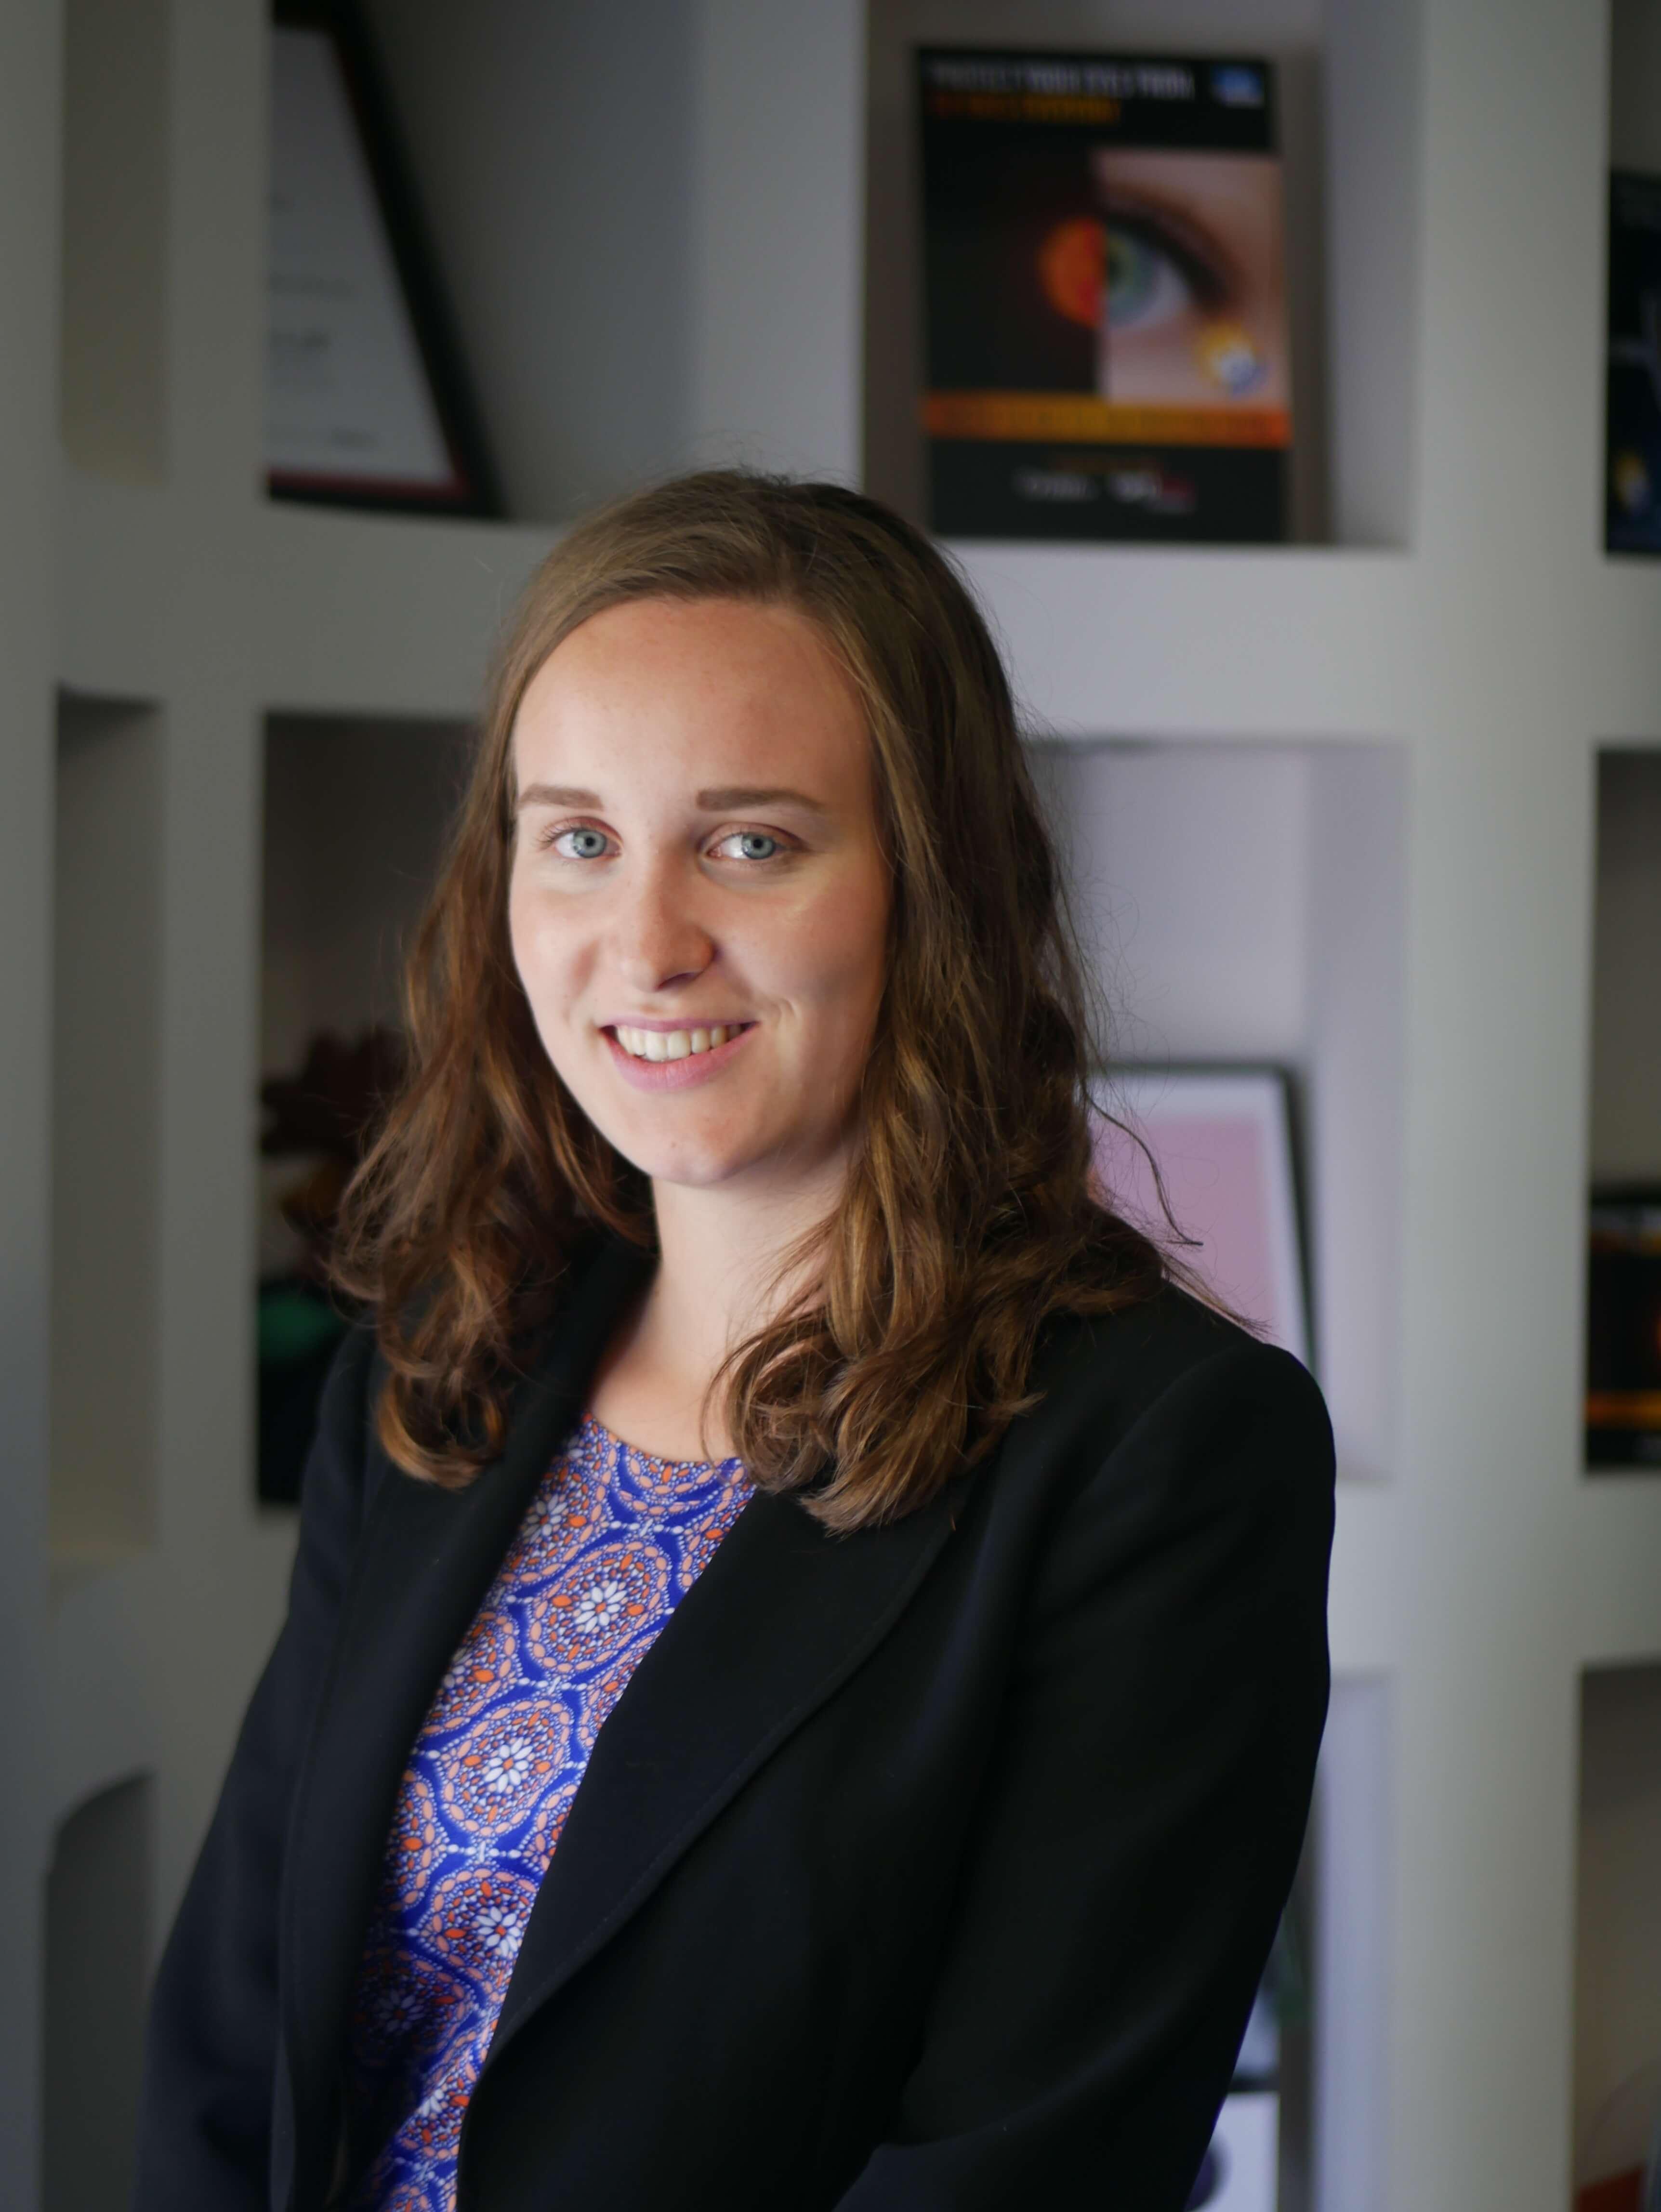 Camilla Laporta - Graduate Optometrist